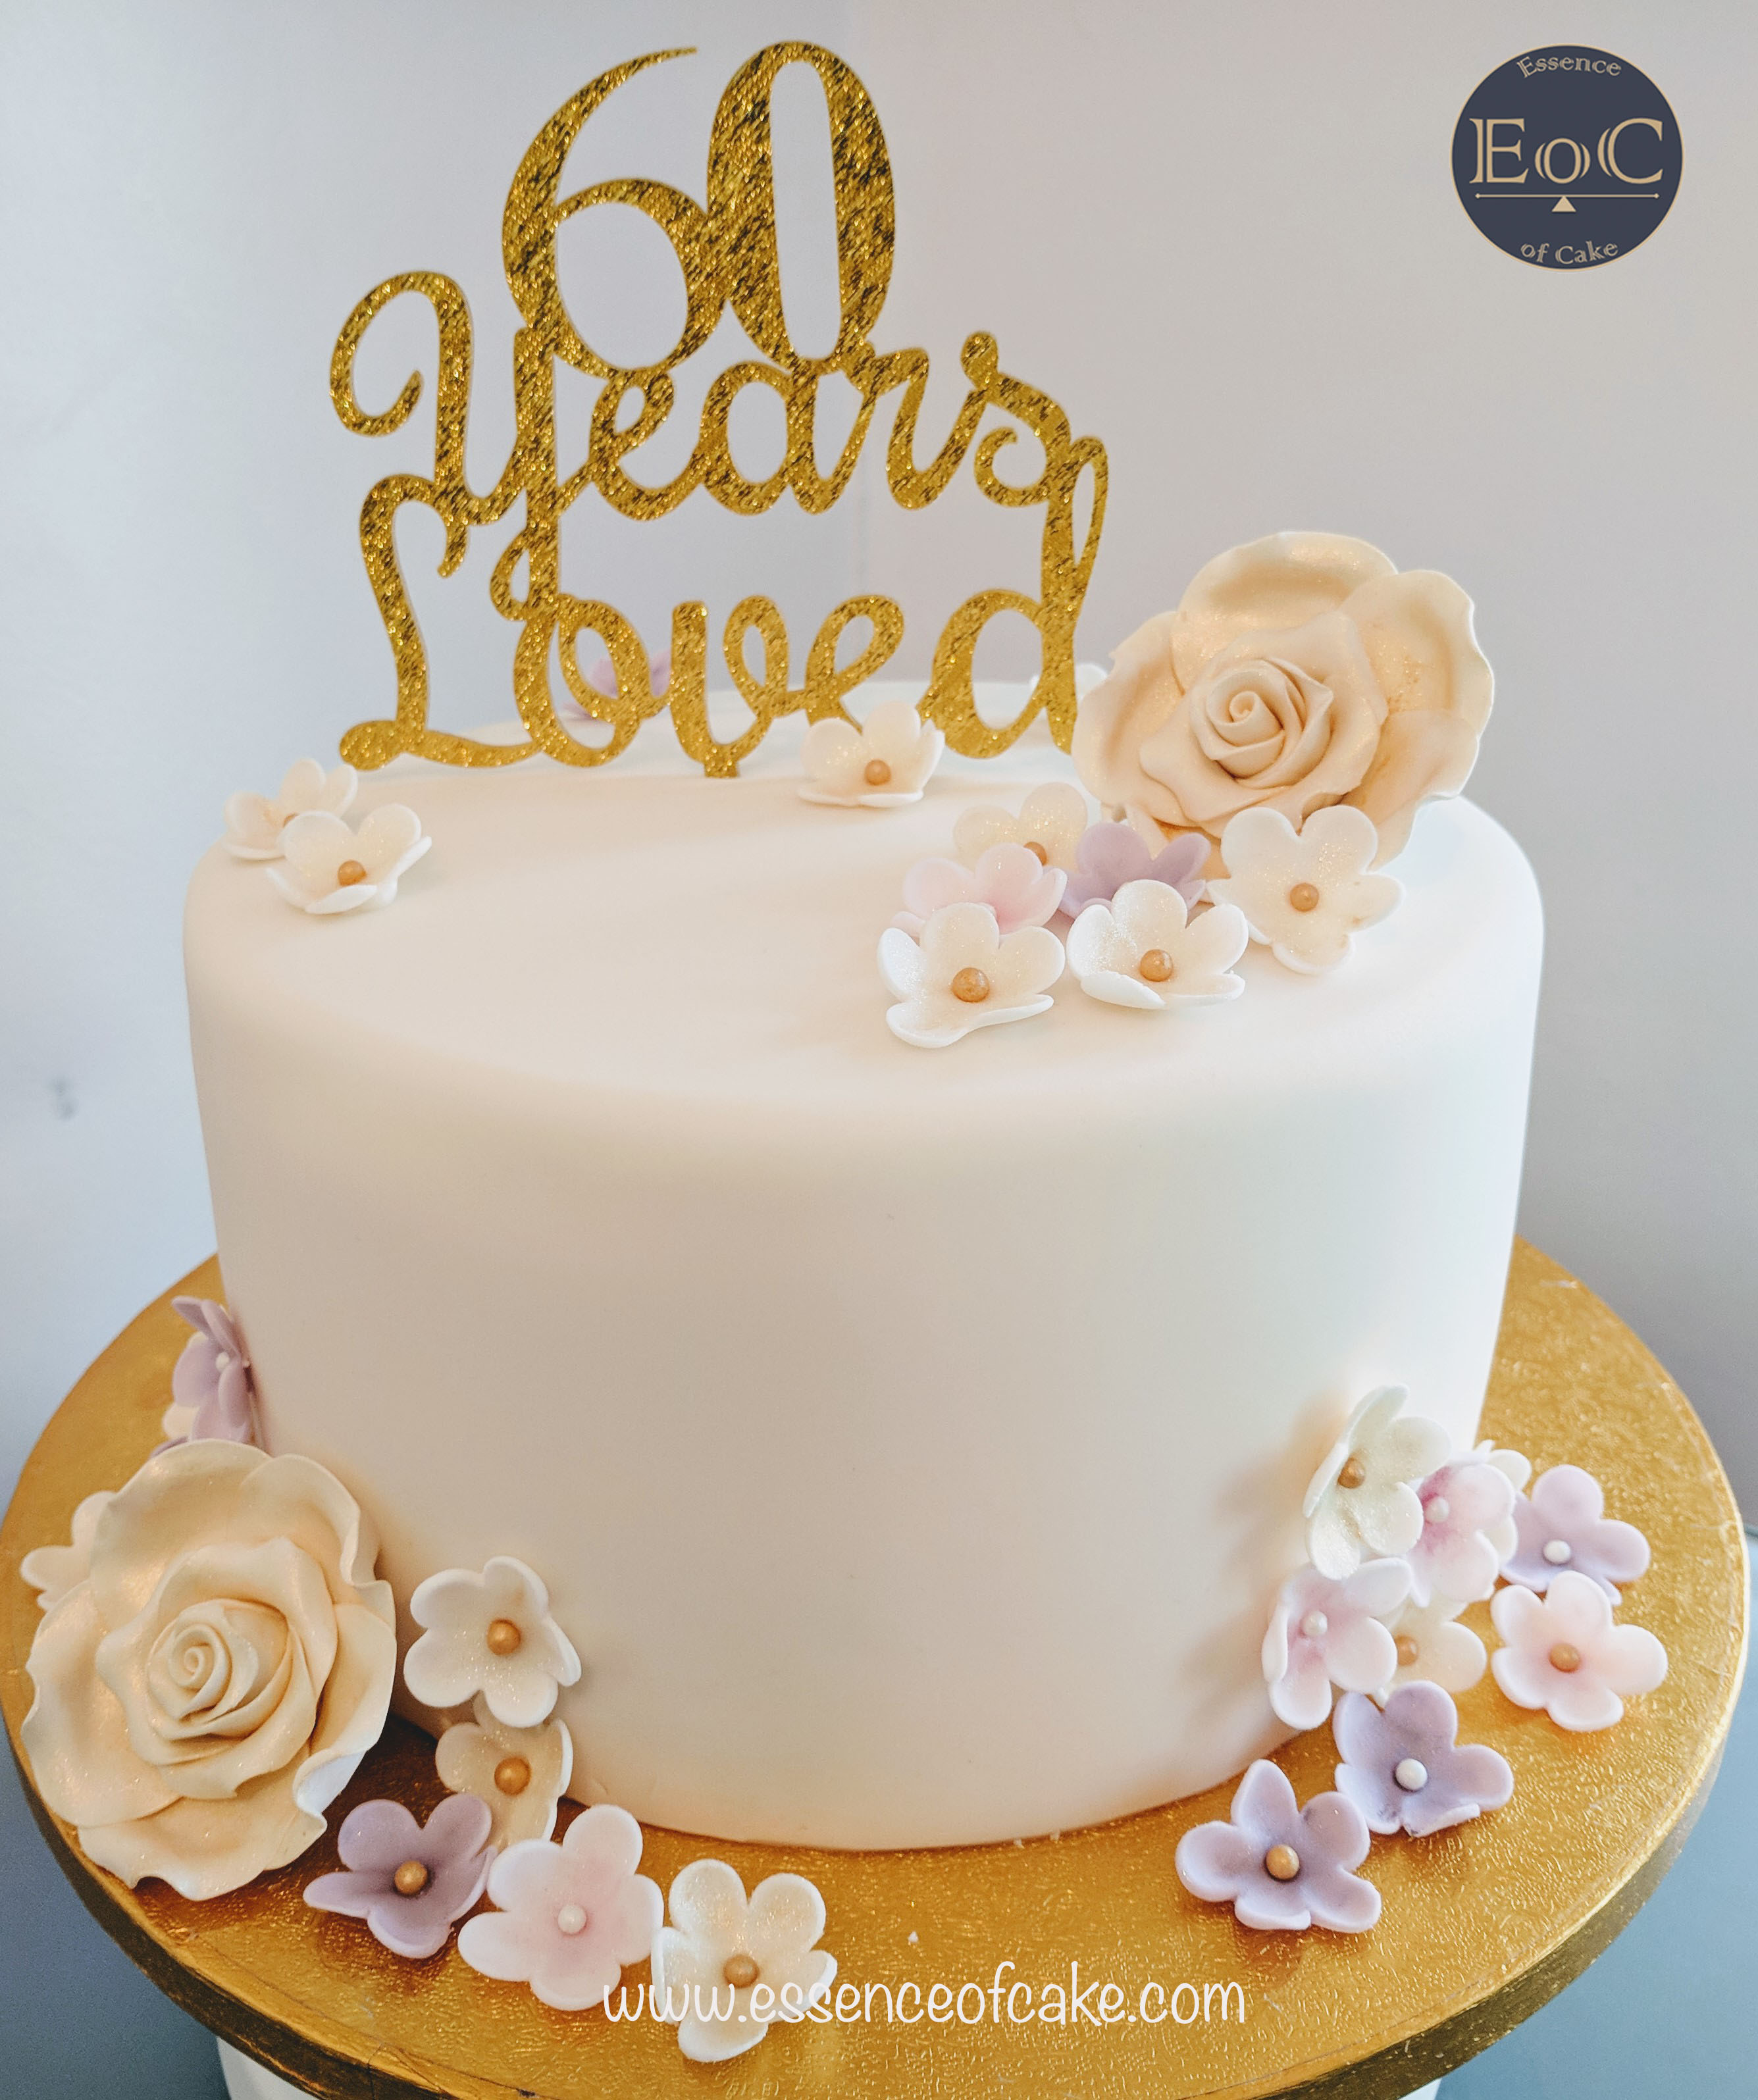 Awesome Cake Gallery Croydon Essence Of Cake Uk Birthday Cards Printable Opercafe Filternl